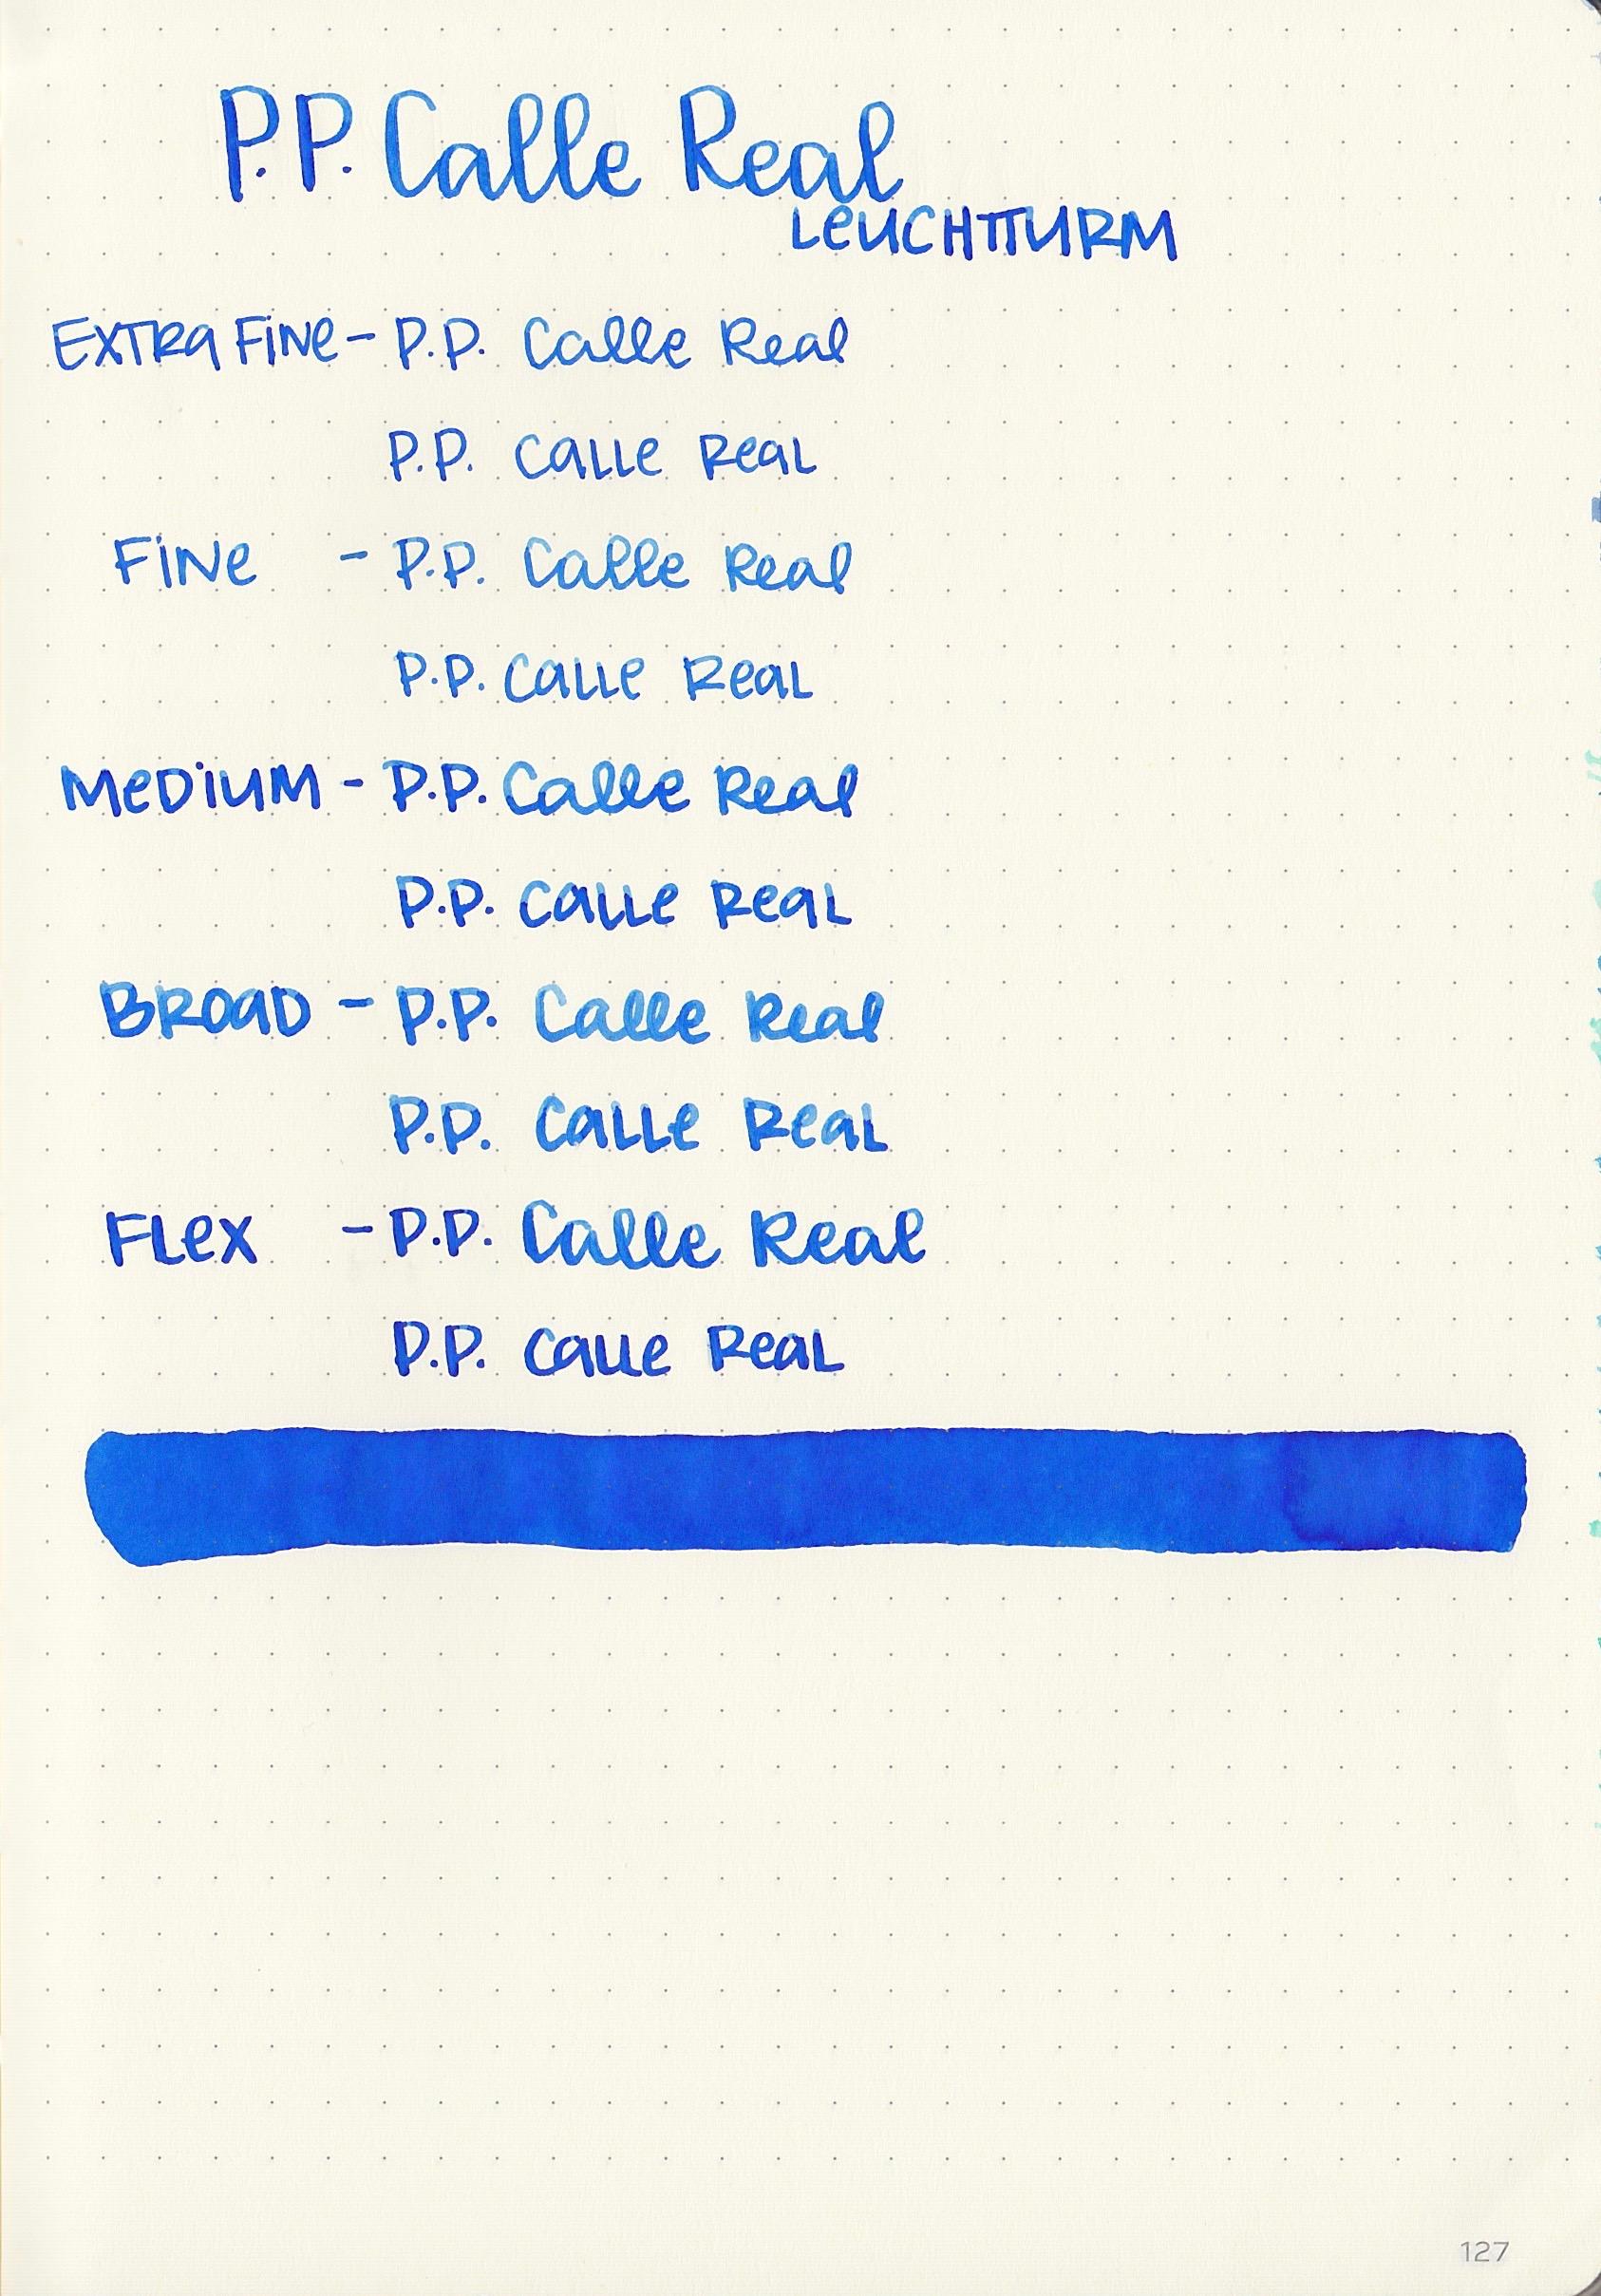 PPCalleReal - 13.jpg